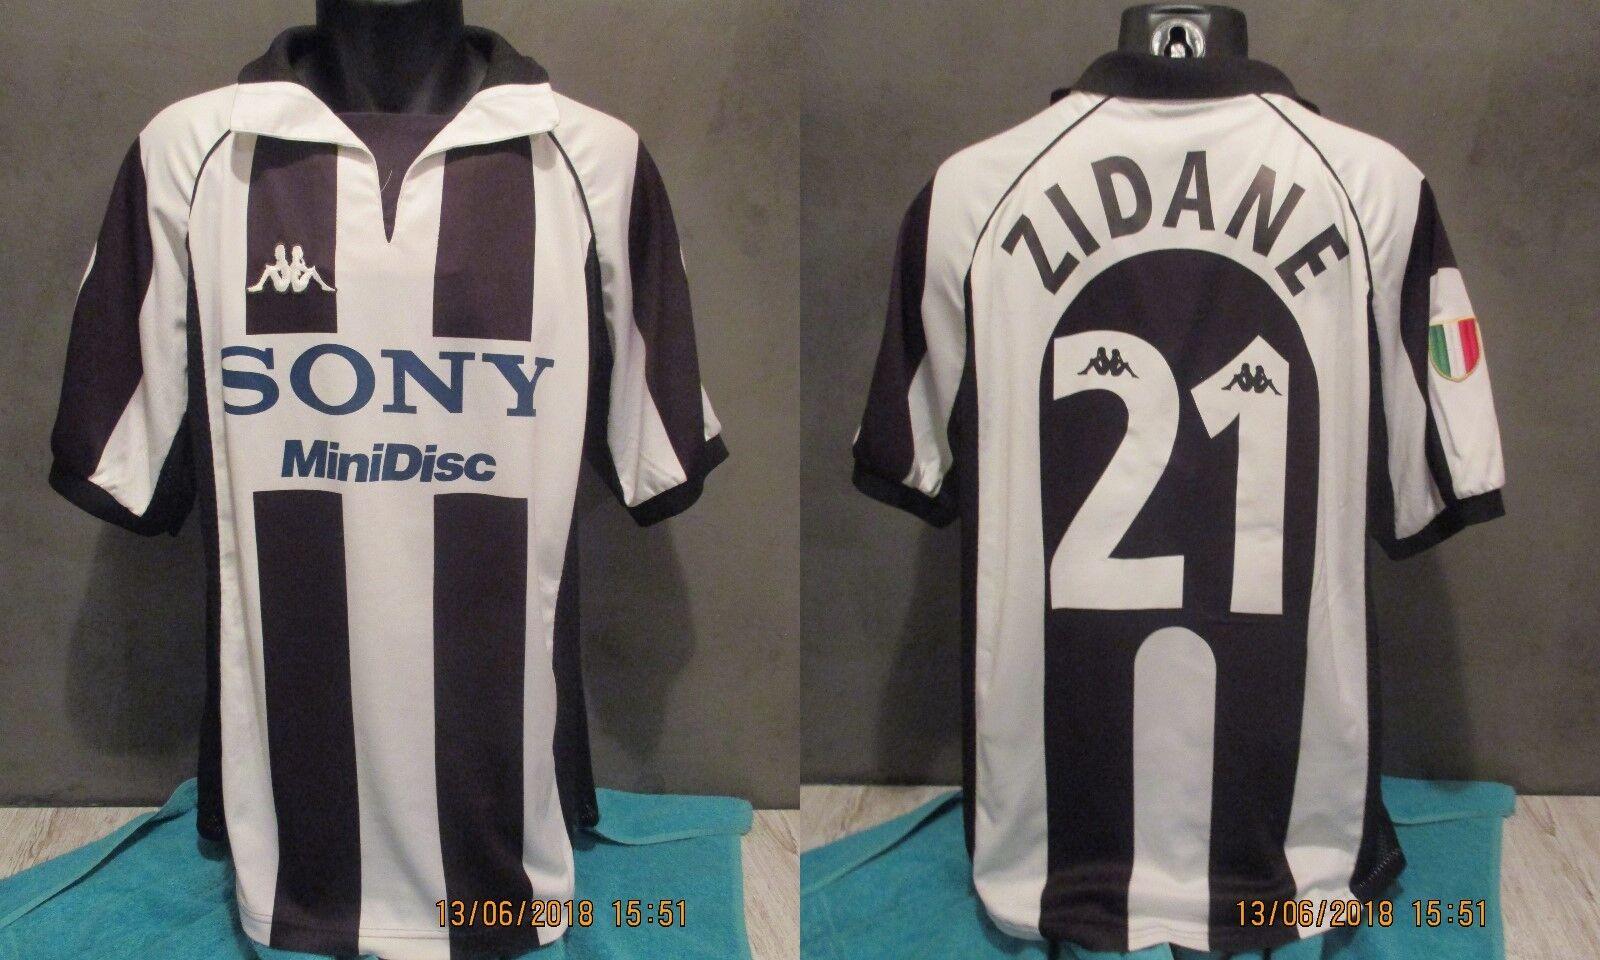 Maglia  JUVENTUS 19961997 ZIDANE VINTAGE 96_97 maillot shirt jersey footbtutti